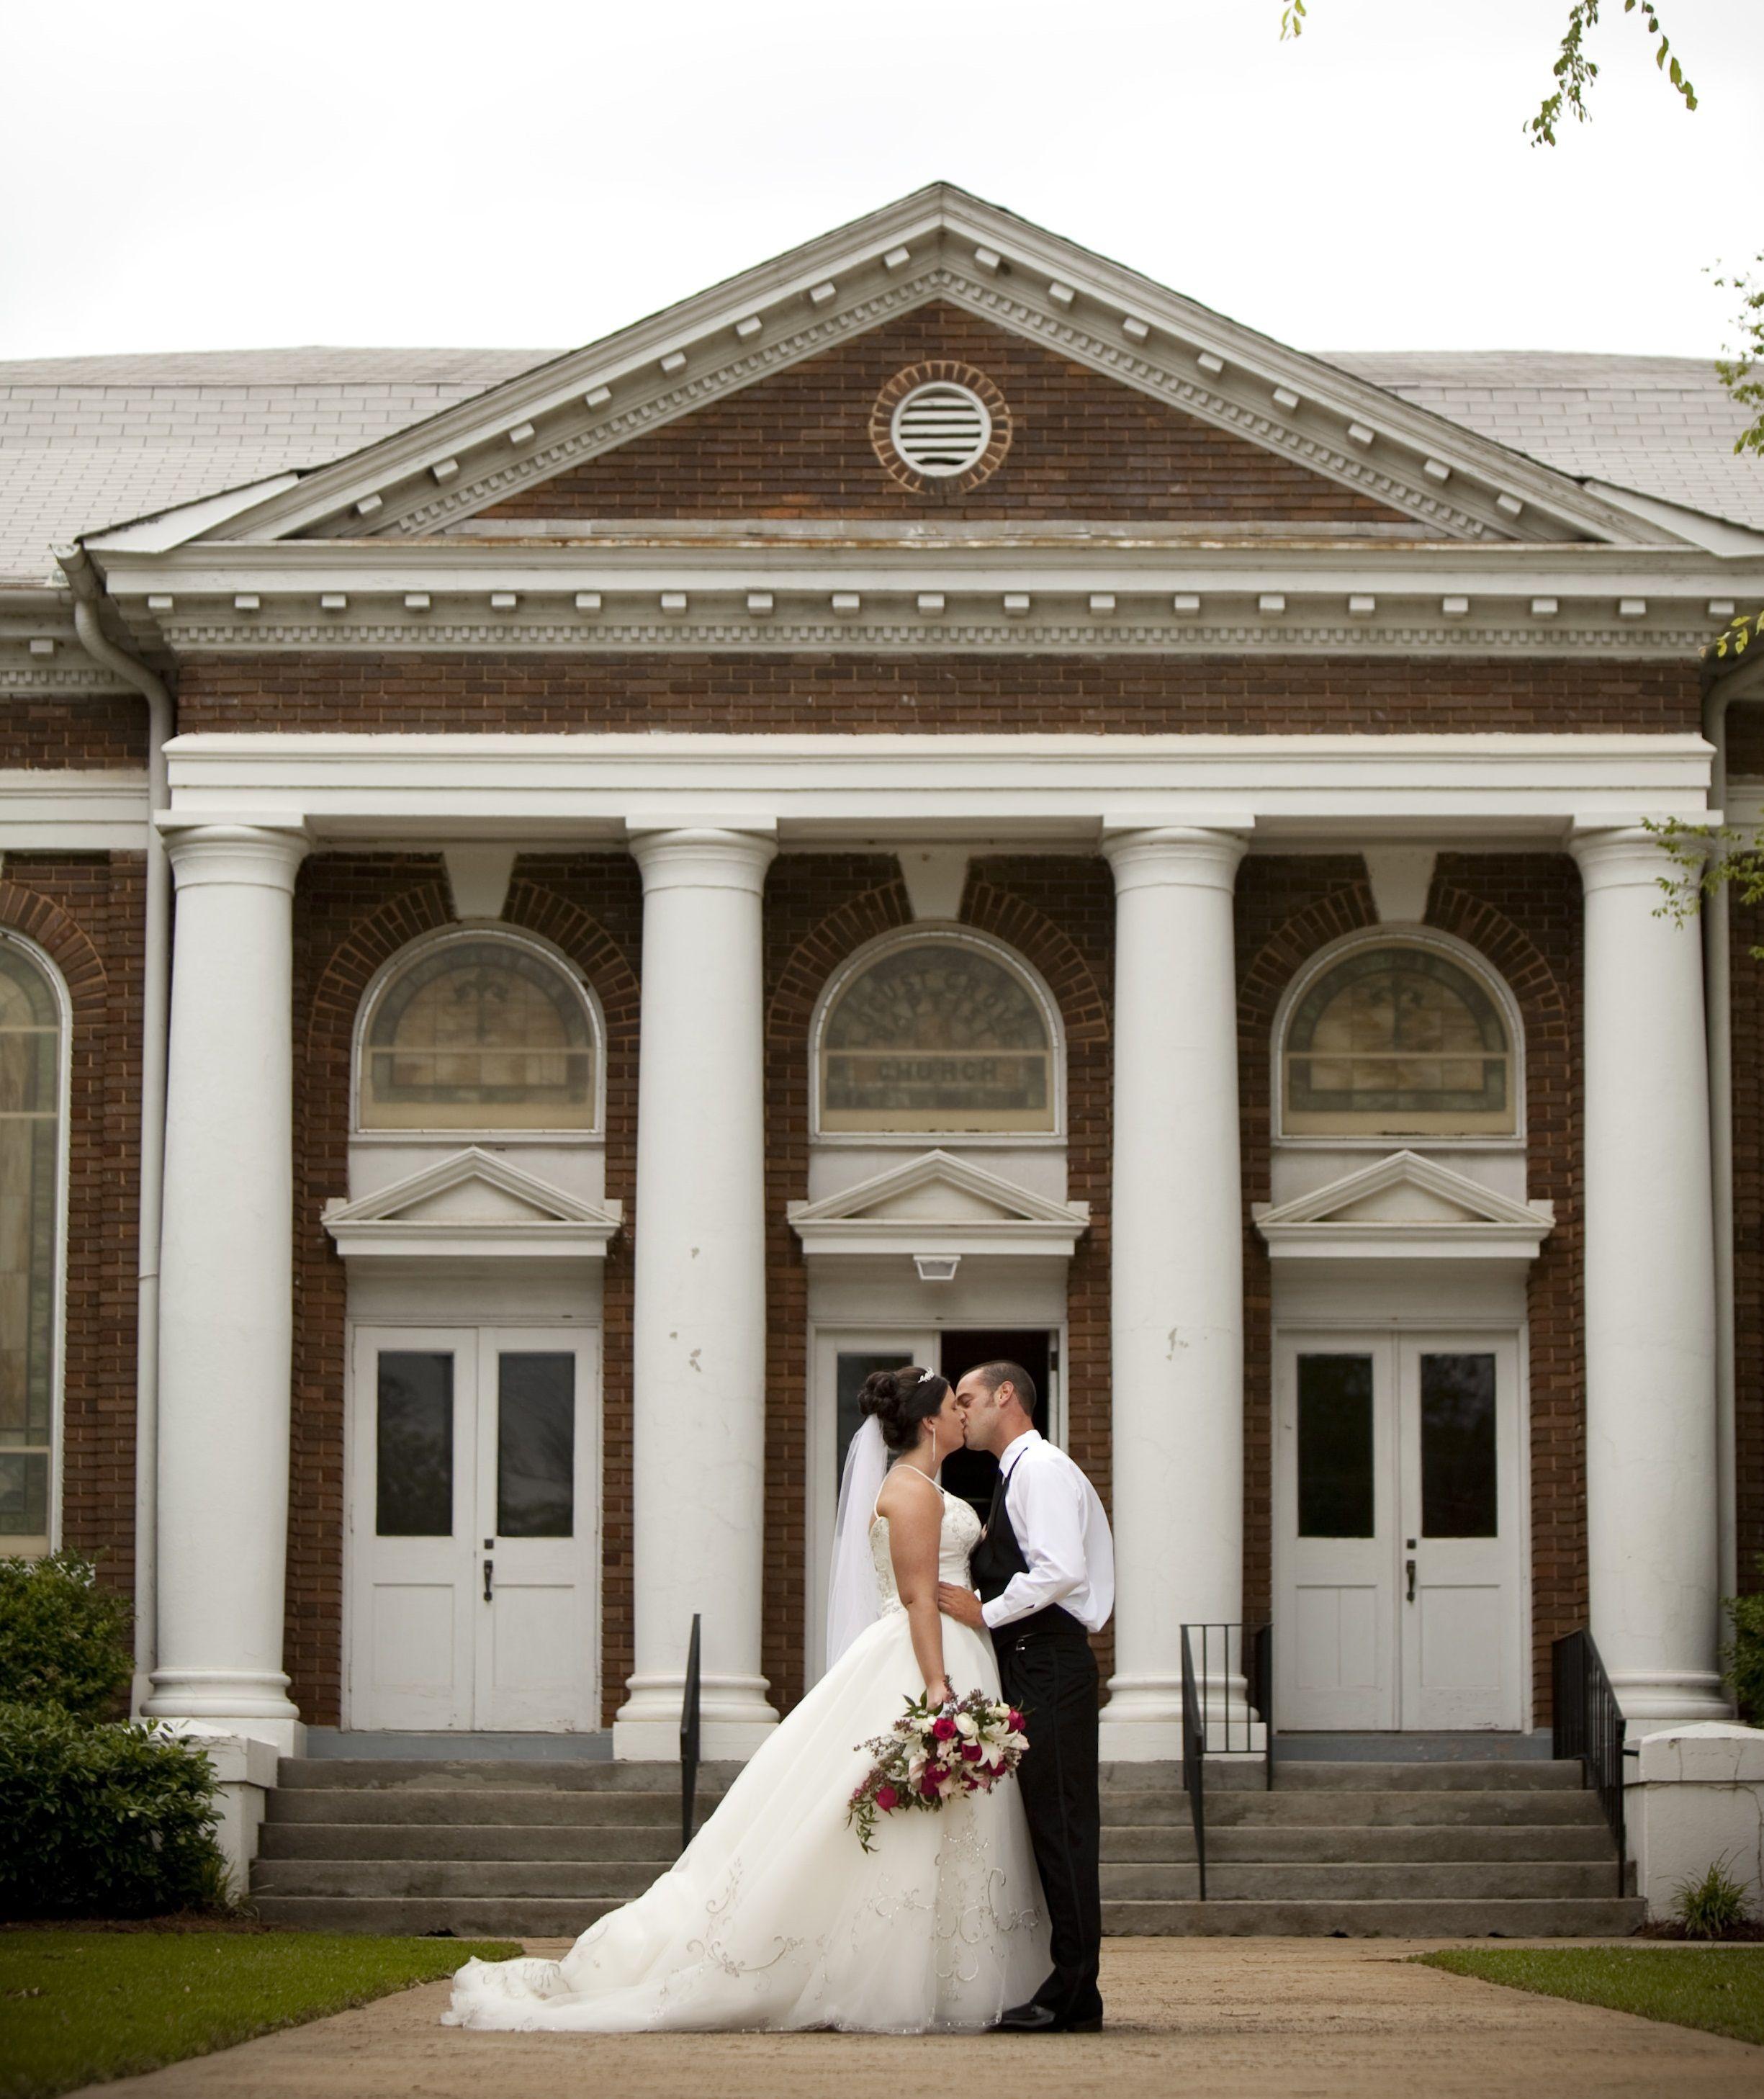 Locust Grove Wedding: Henry County CVB